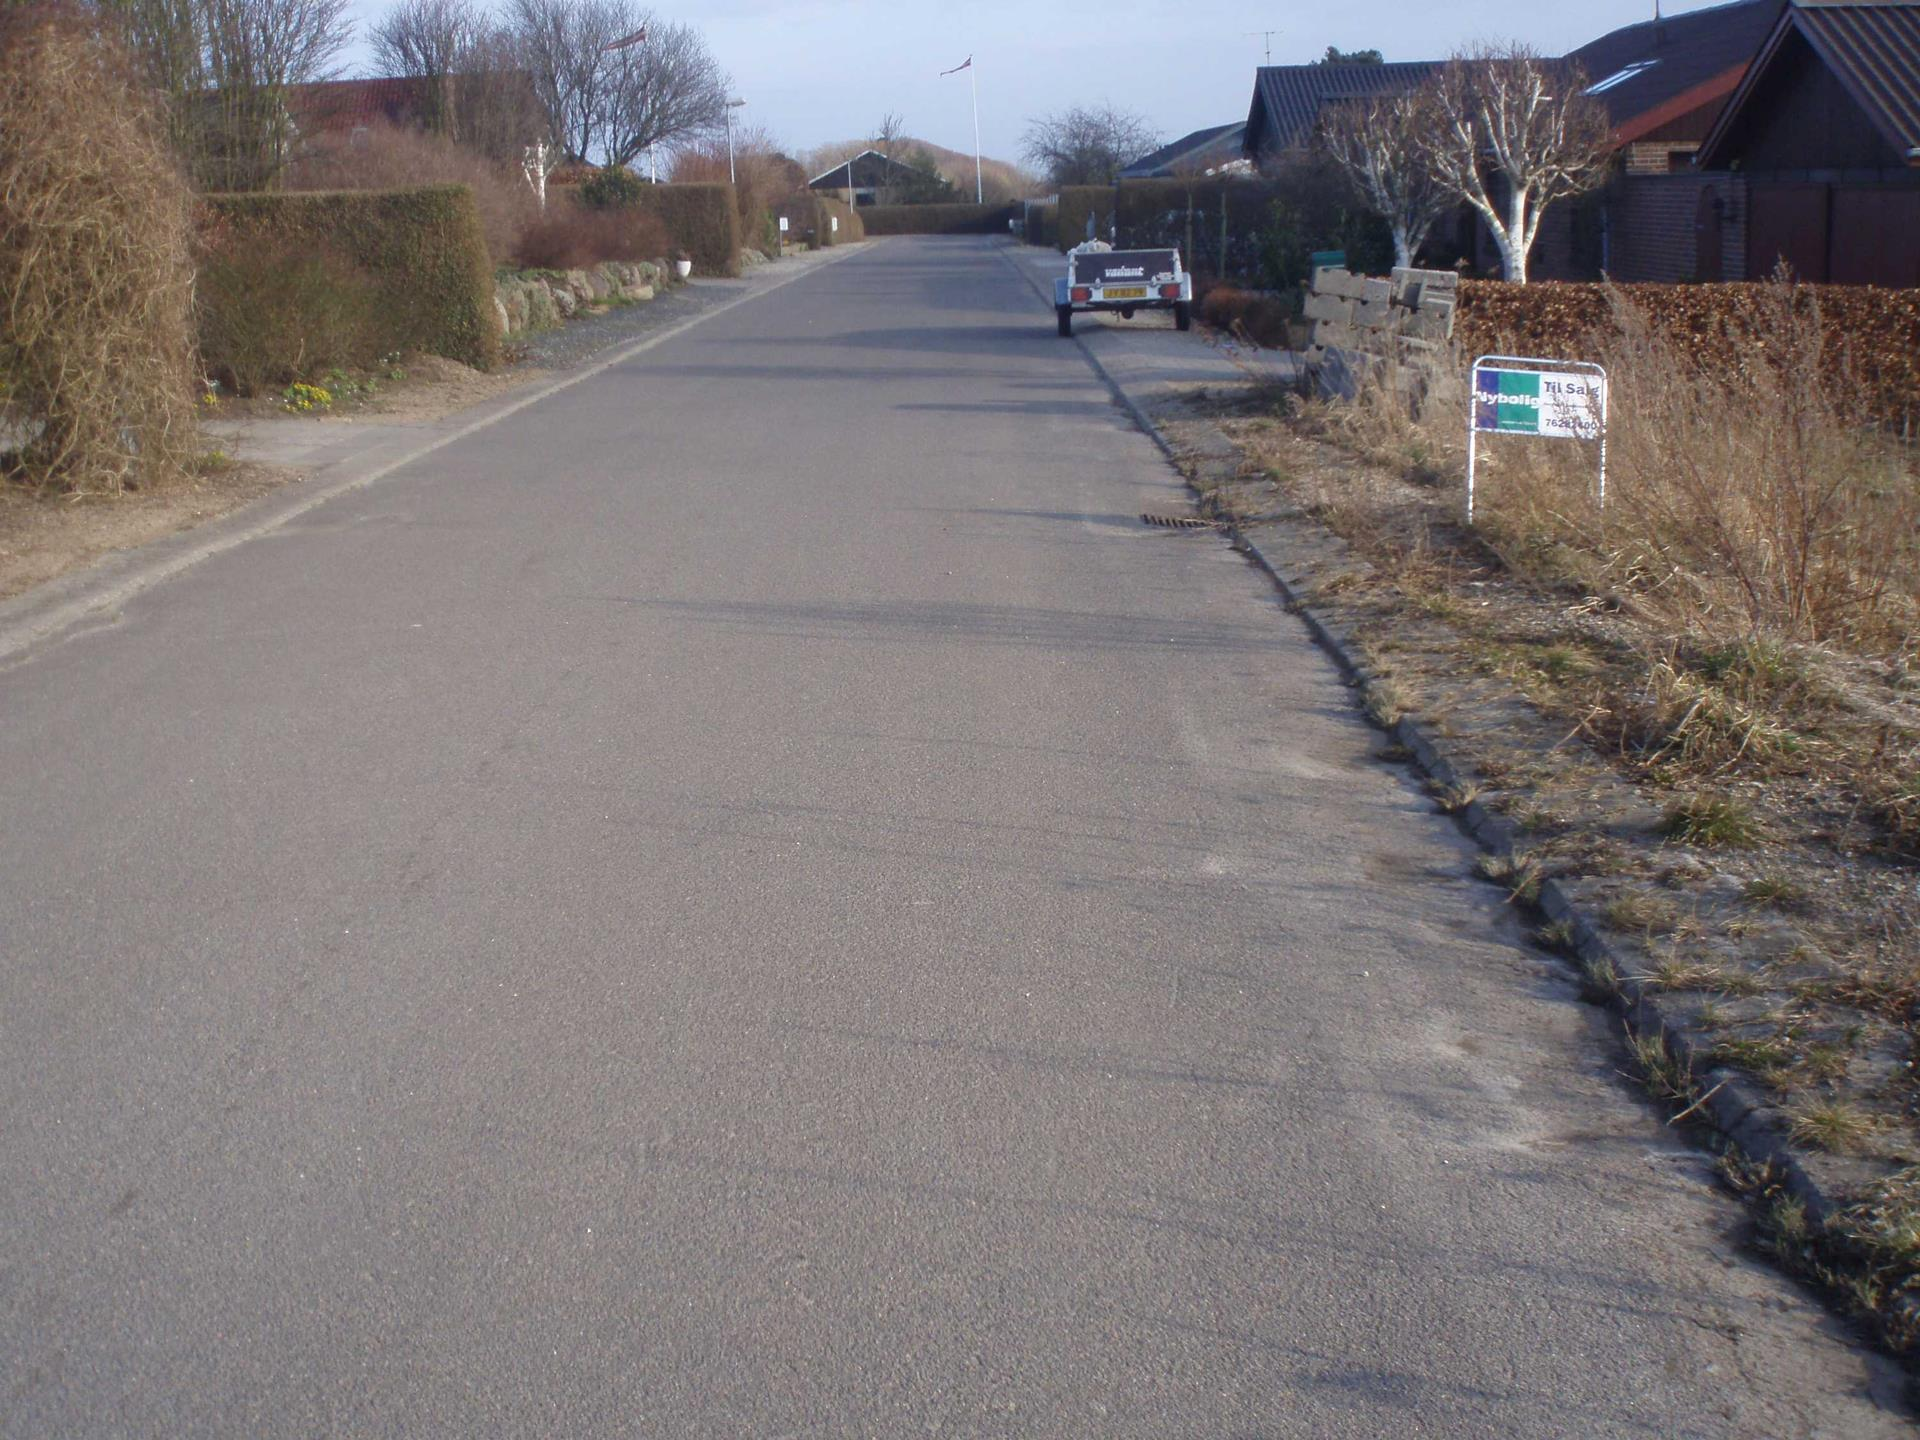 Helårsgrund på Skrænten i Juelsminde - Grund